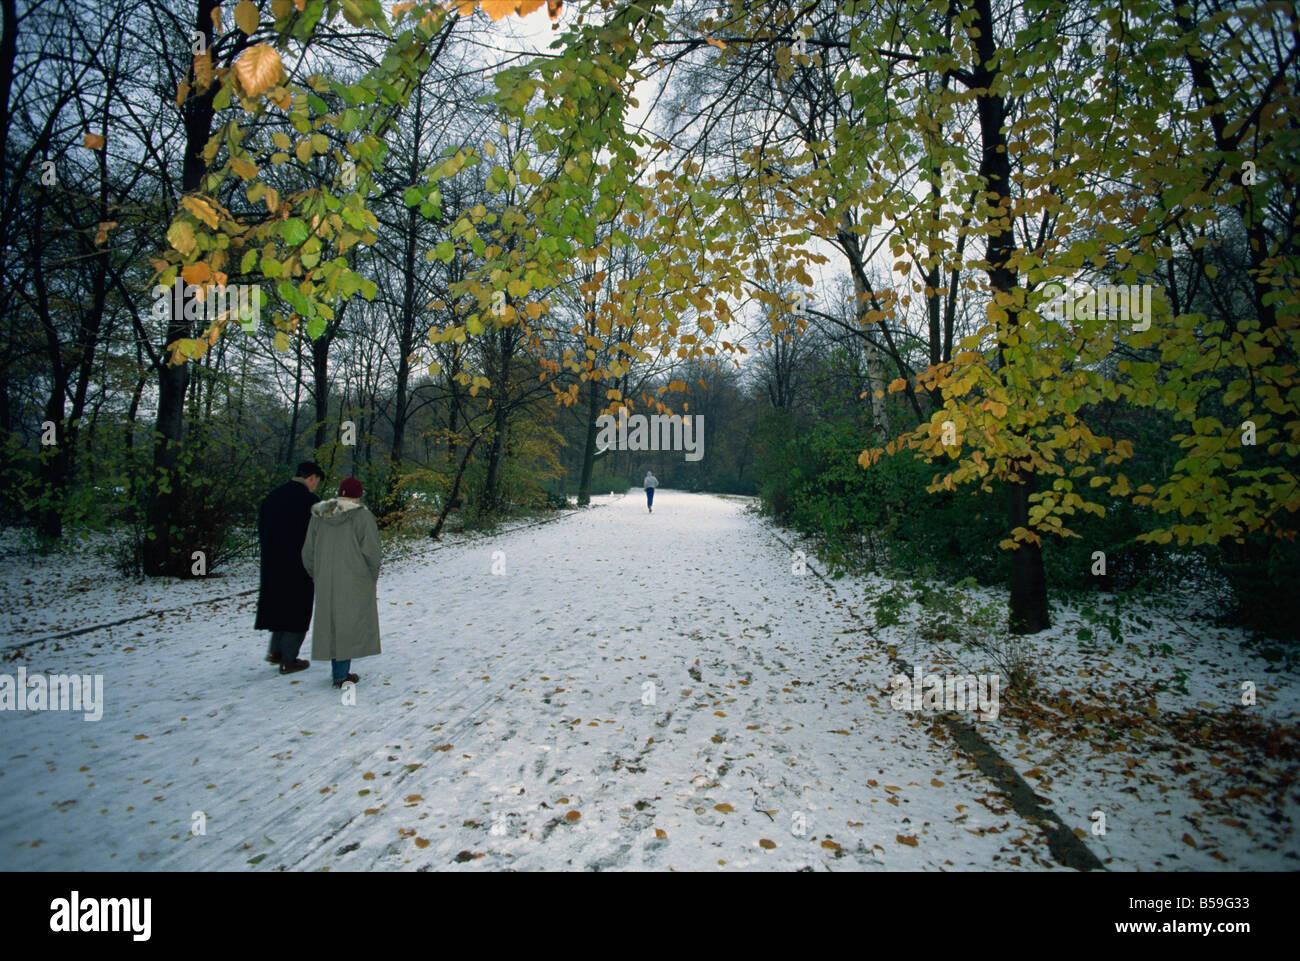 Couple walking in the snow in the Tiergarten, Berlin, Germany, Europe - Stock Image